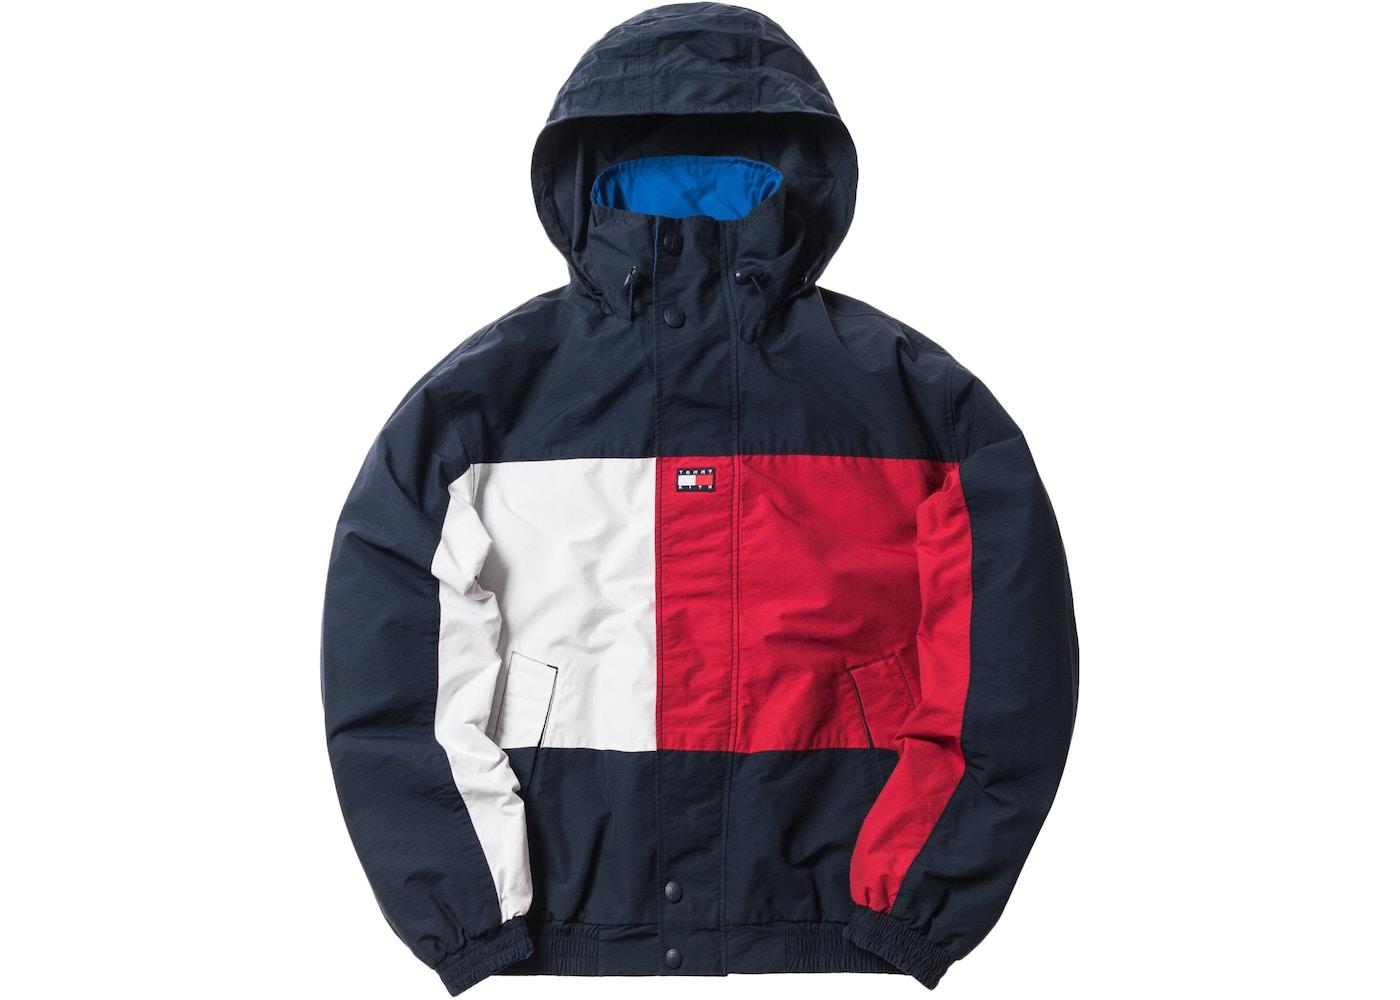 da49fee8f Kith Jackets - Buy & Sell Streetwear